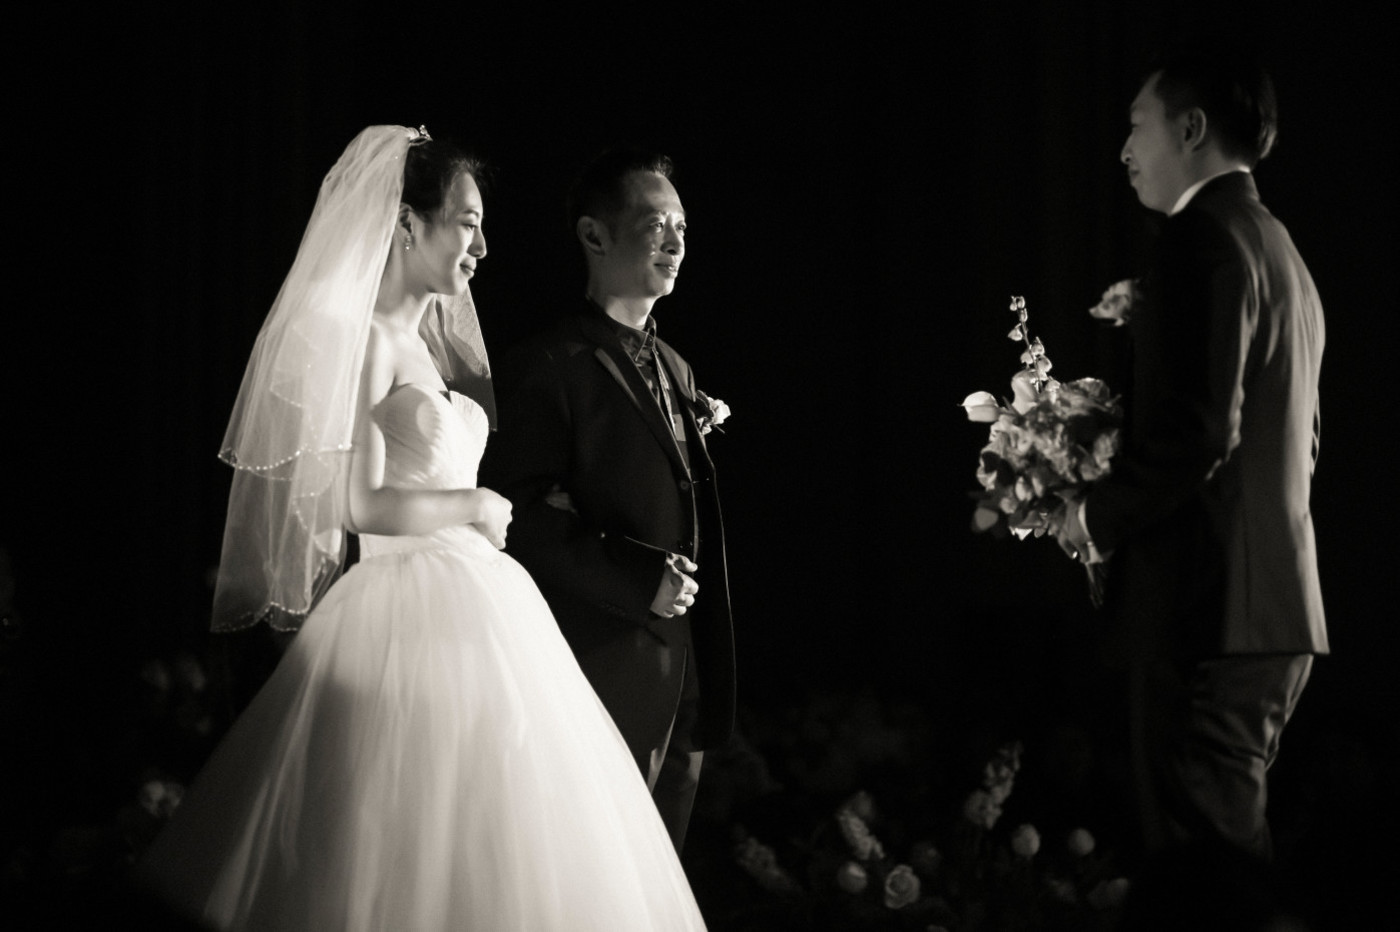 【KAI 婚礼纪实】Z&Y 常州婚礼26